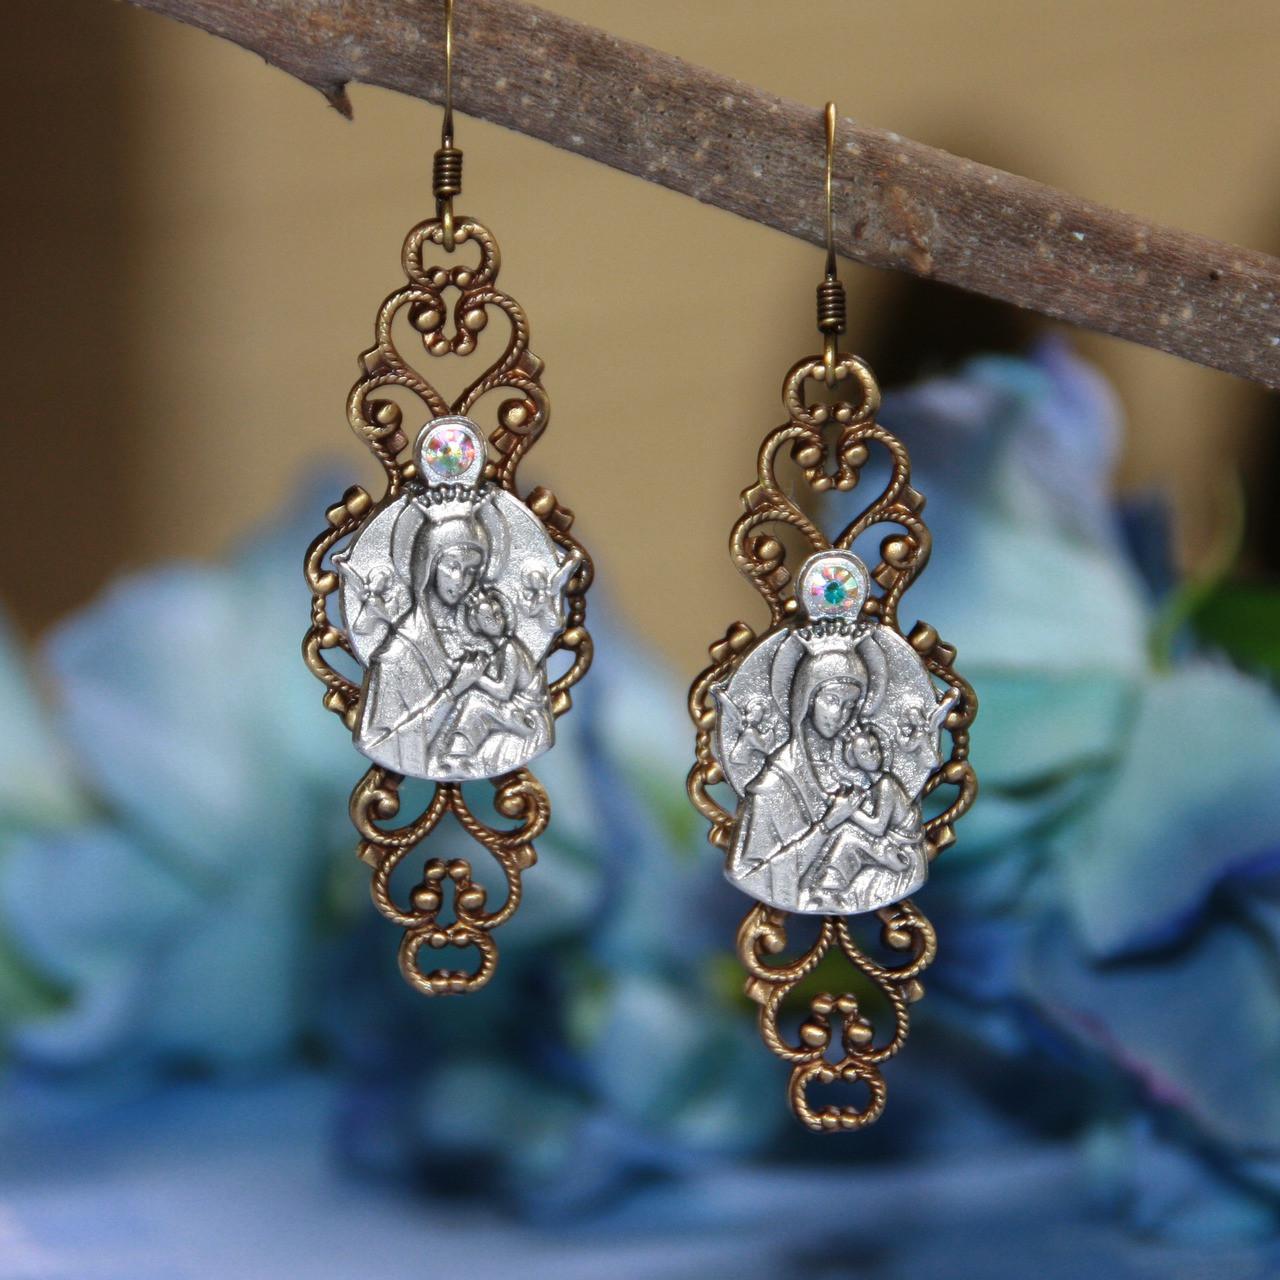 IN-50  Our Lady of Fatima Beautiful Earrings